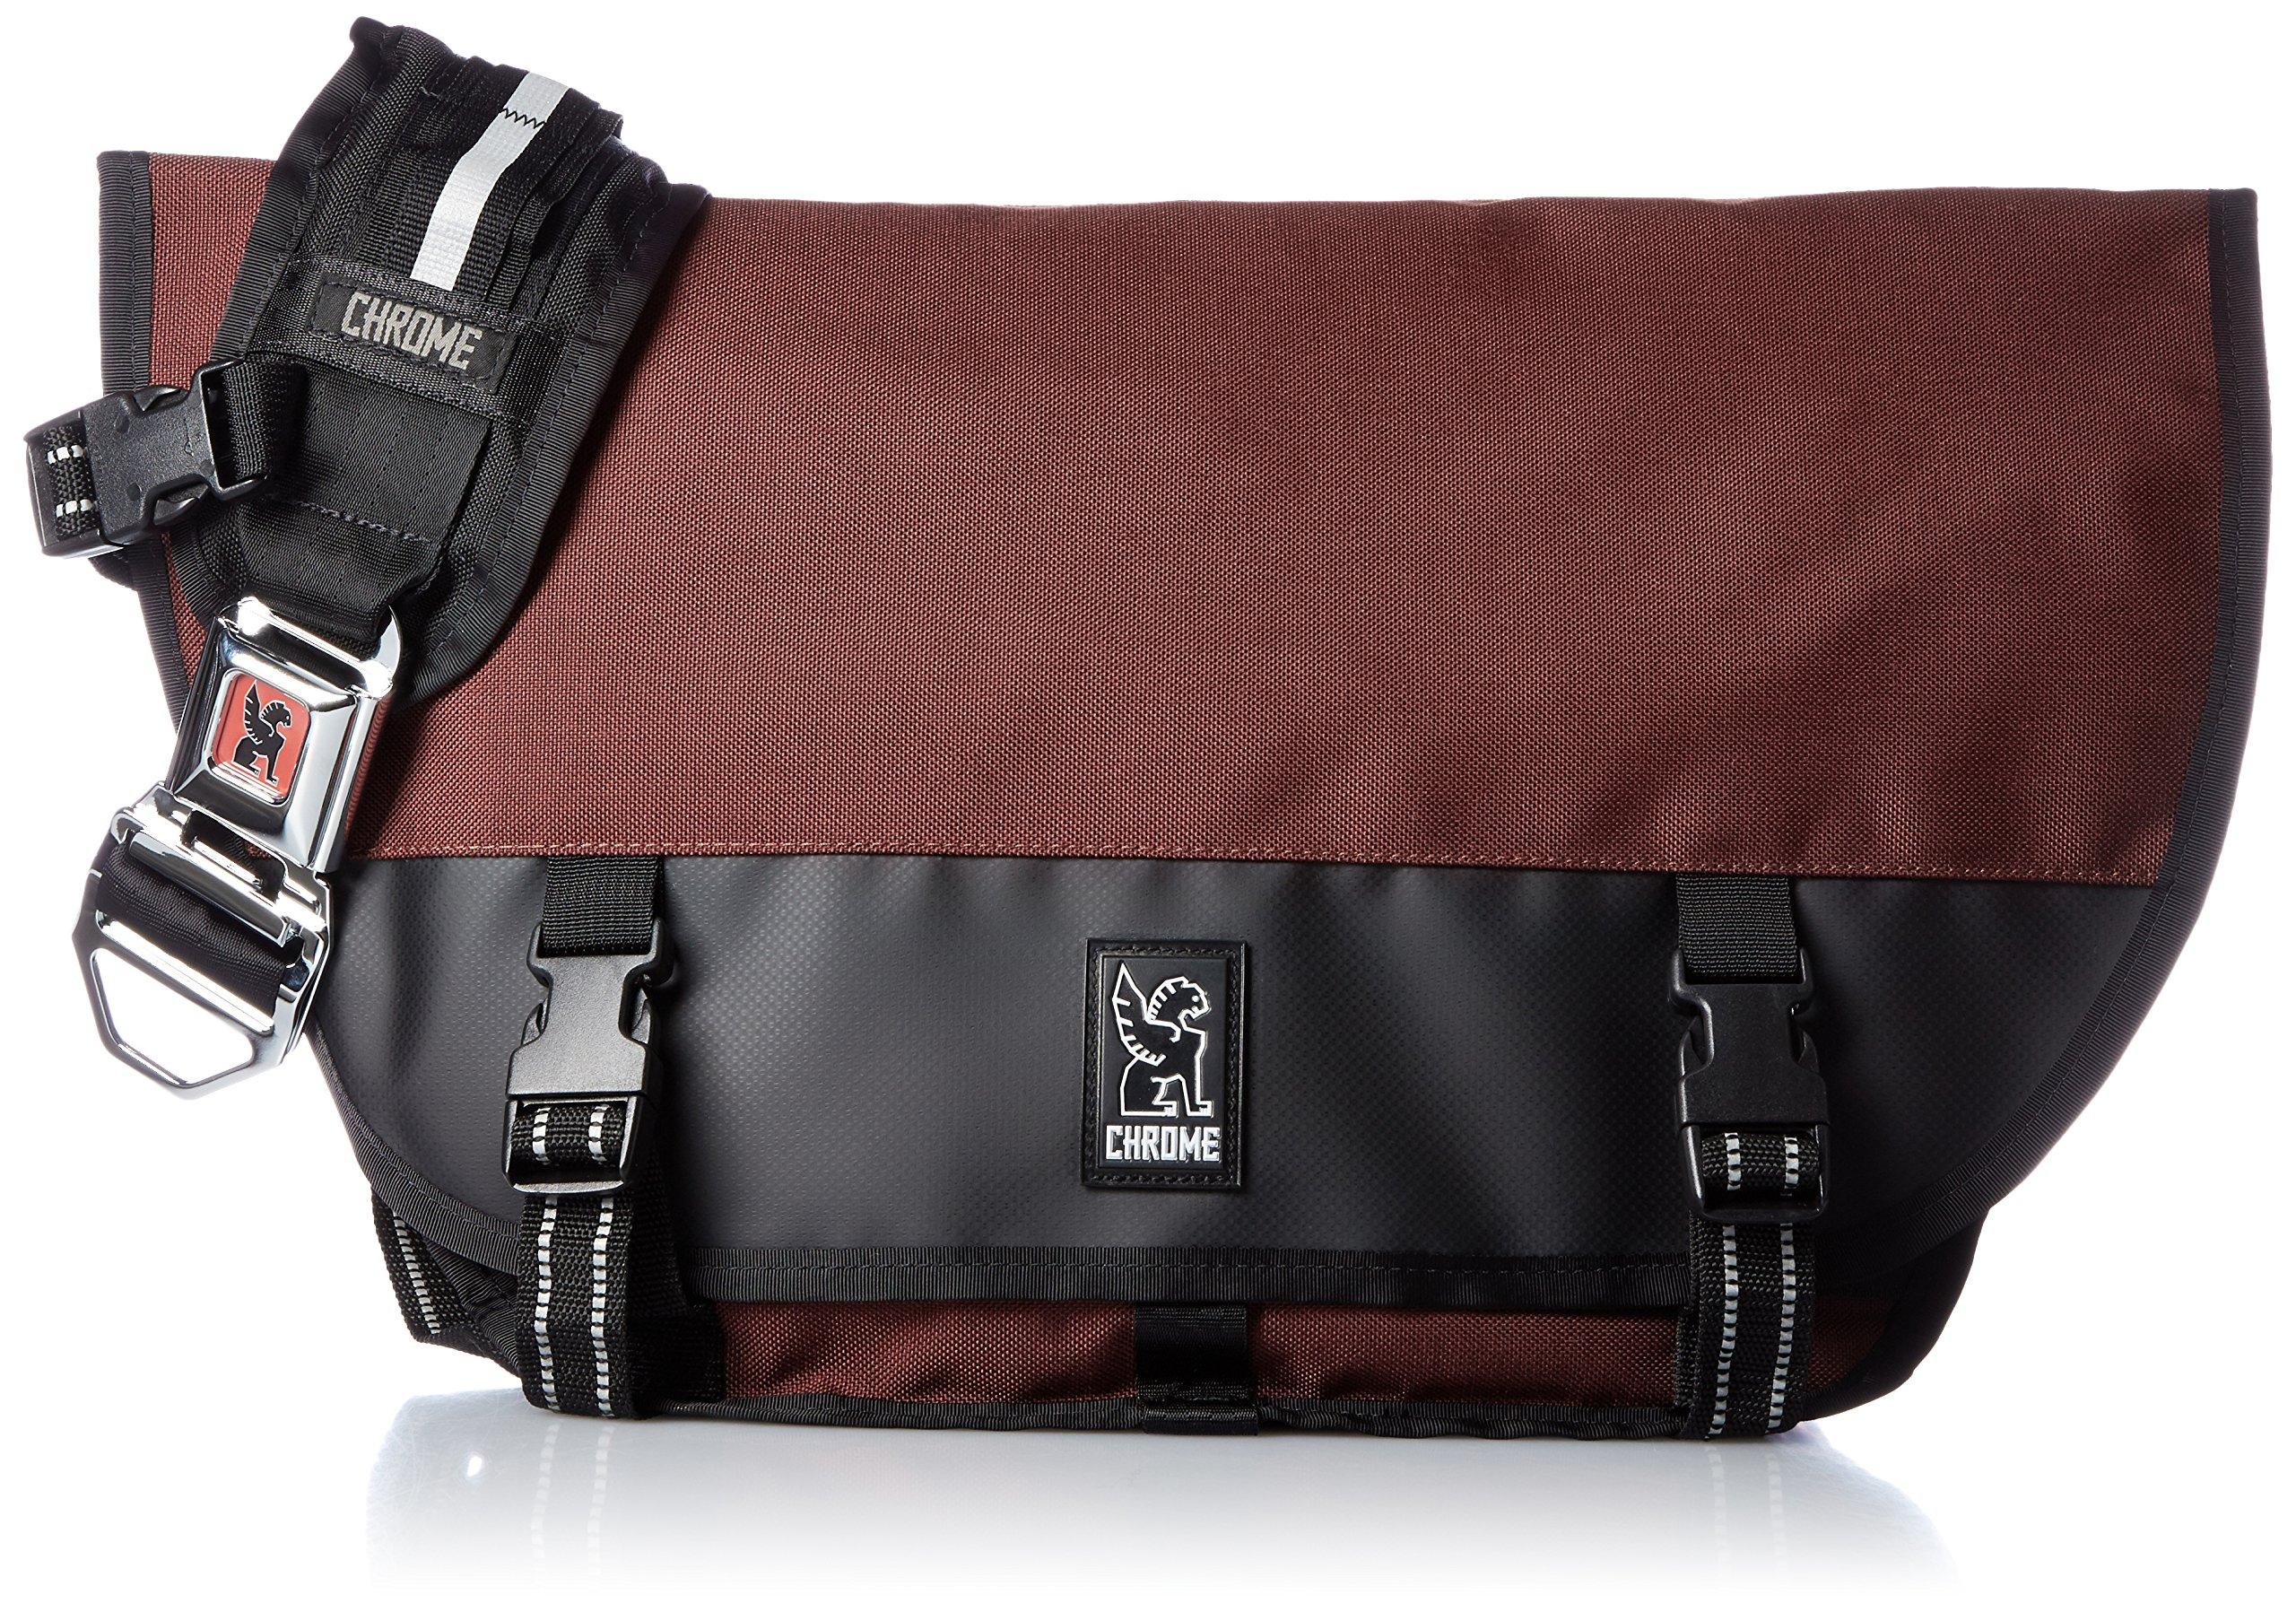 Chrome BG-001-BRIK Brick/Black One Size Mini Metro Messenger Bag Chrome Buckle